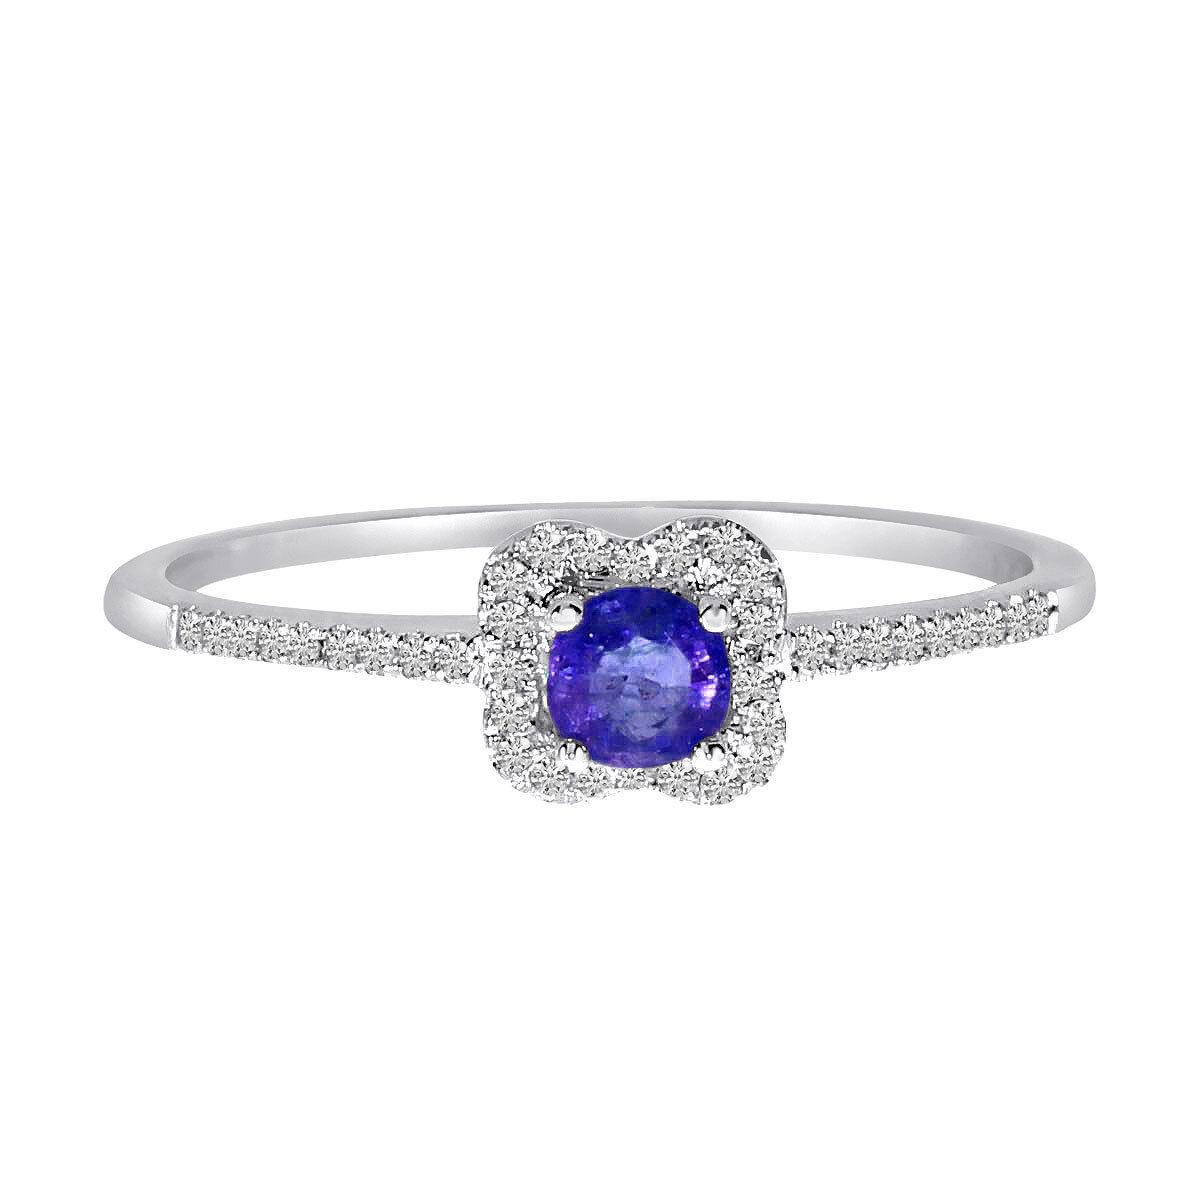 14k White gold Sapphire and .11 ct Diamond Ring